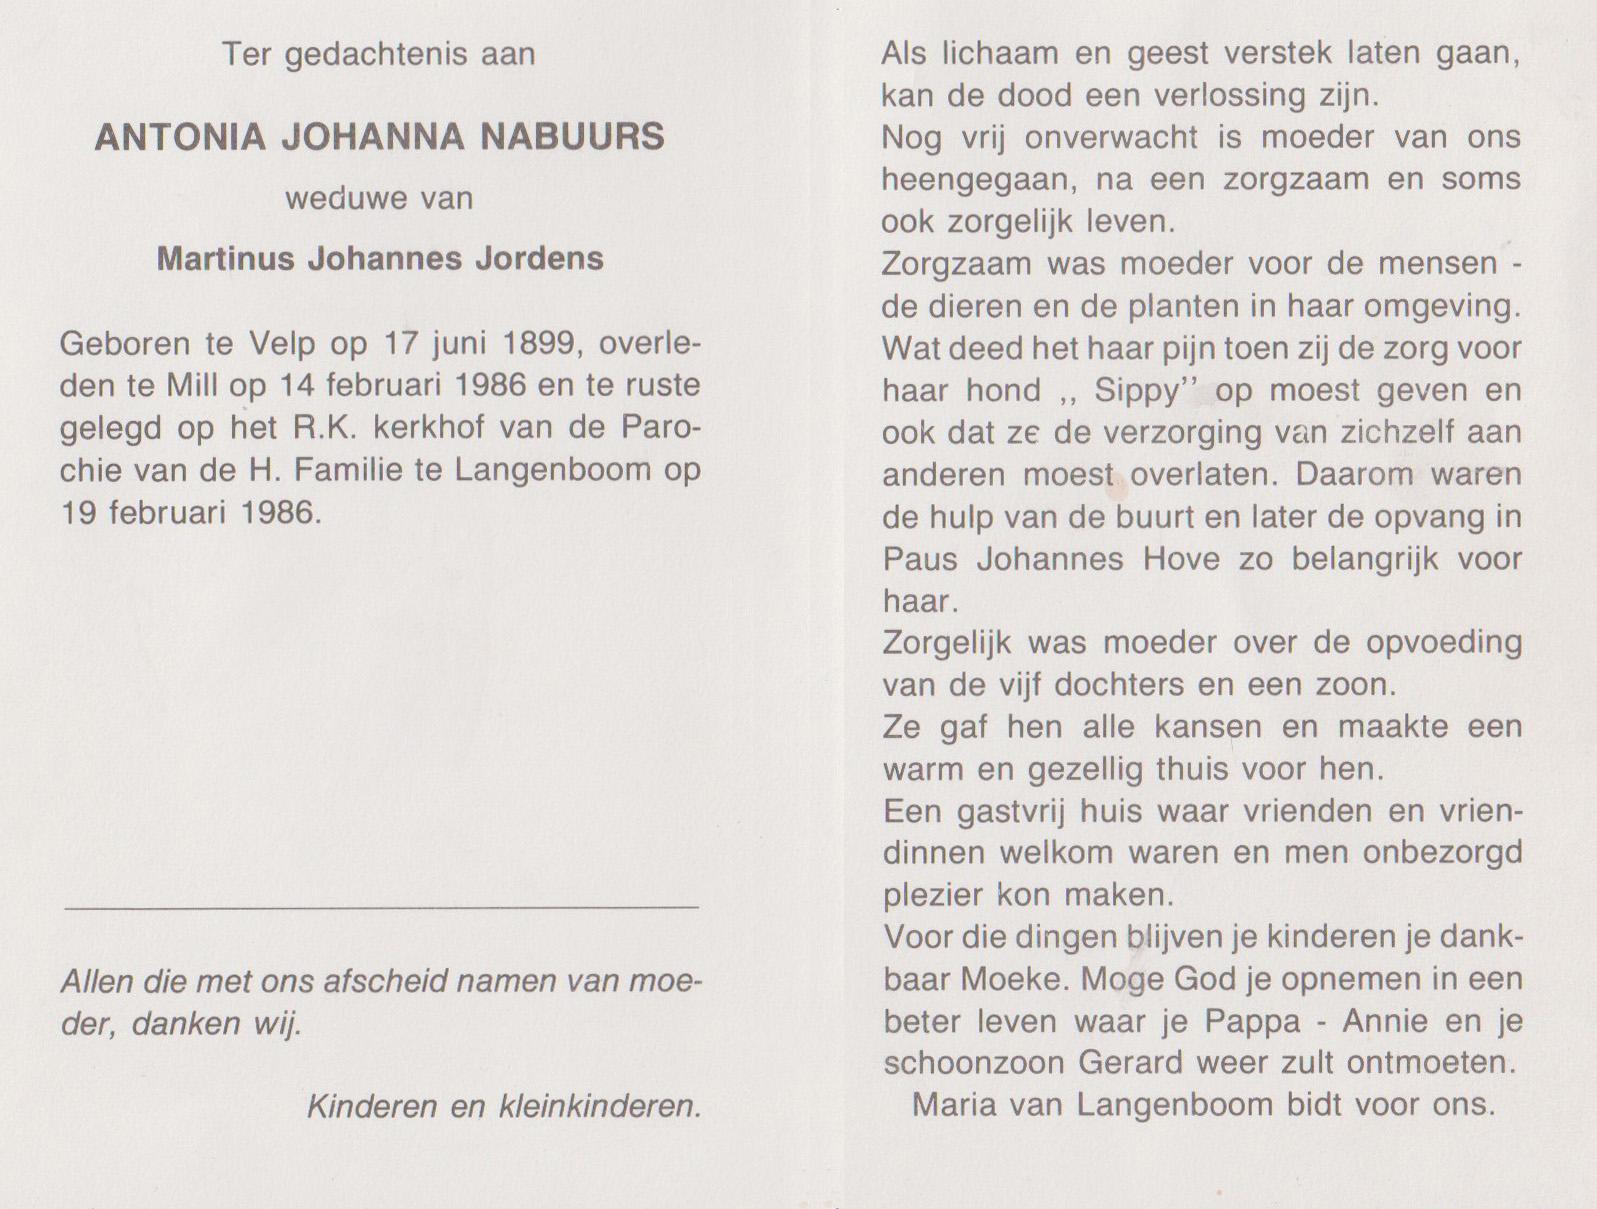 Bidprentje Antonia JohannaNabuurs